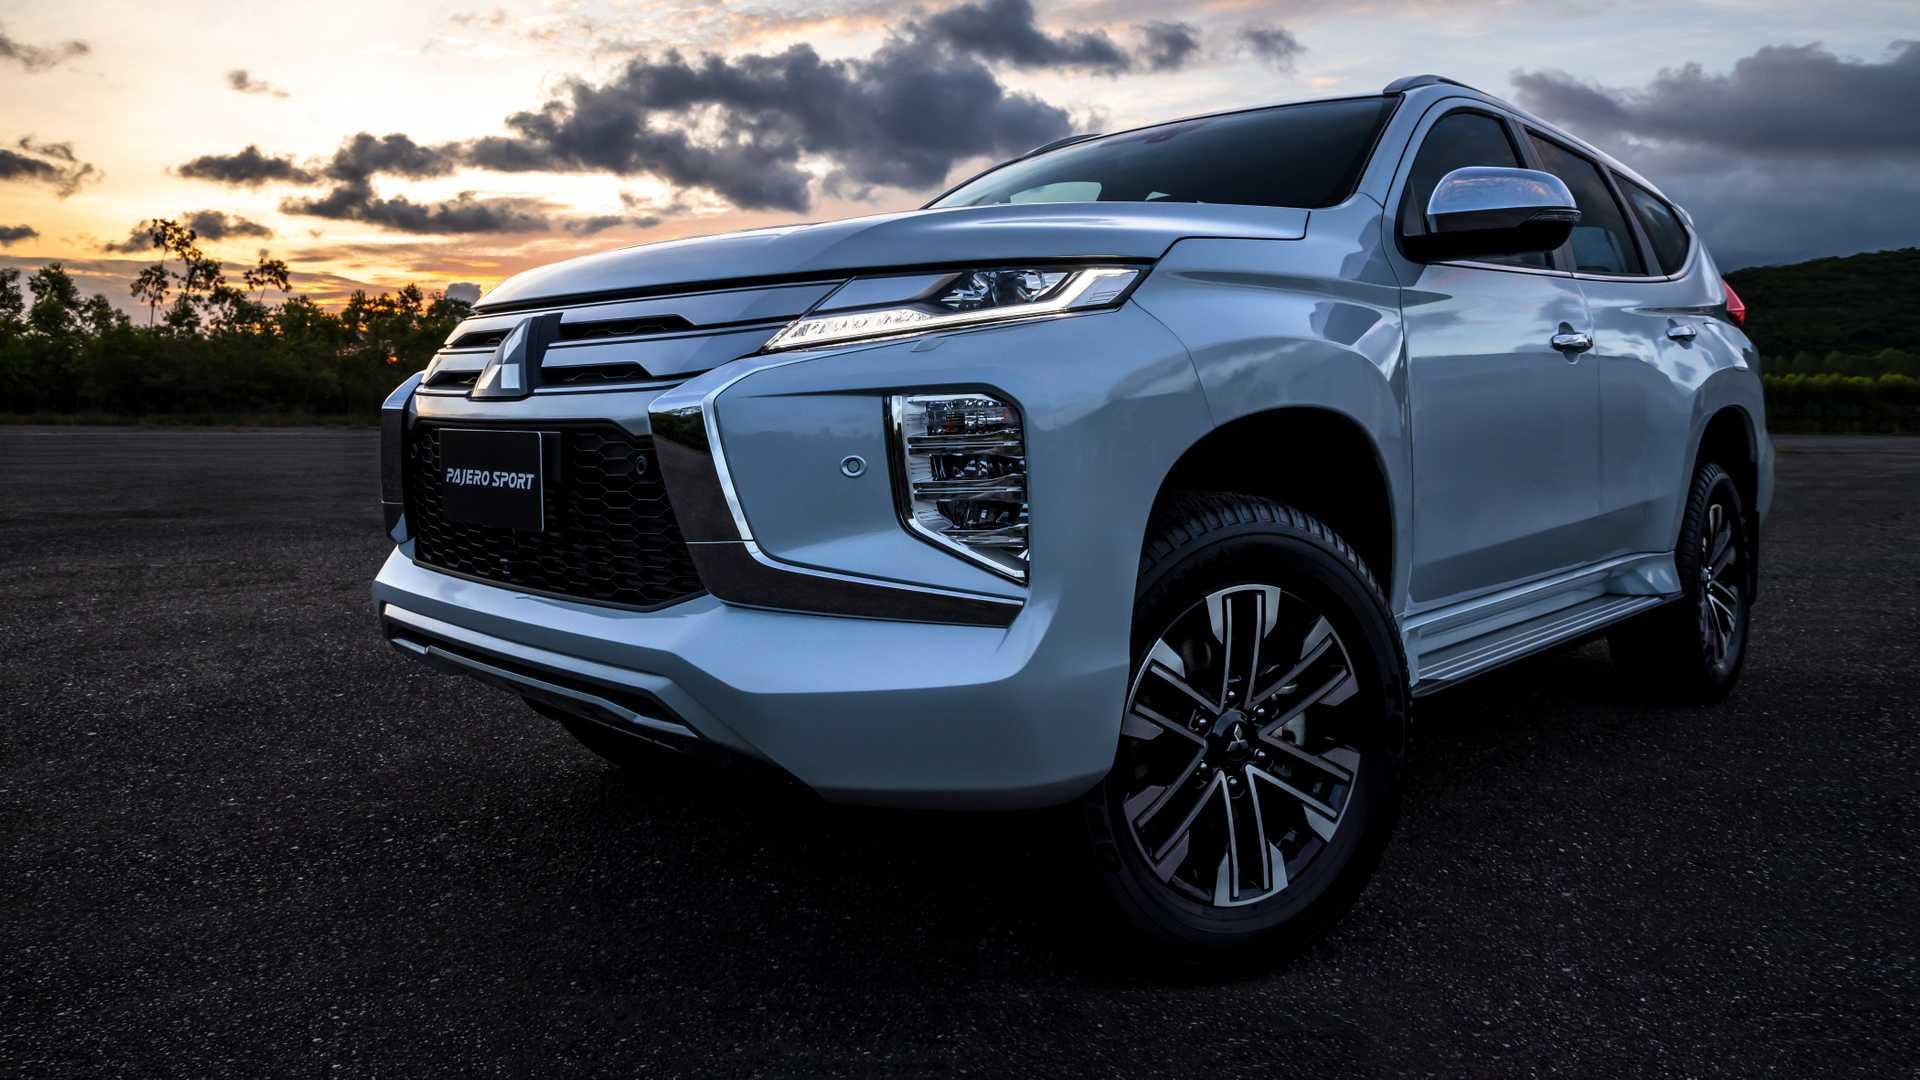 2020_Mitsubishi_Pajero_Sport_facelift_0009